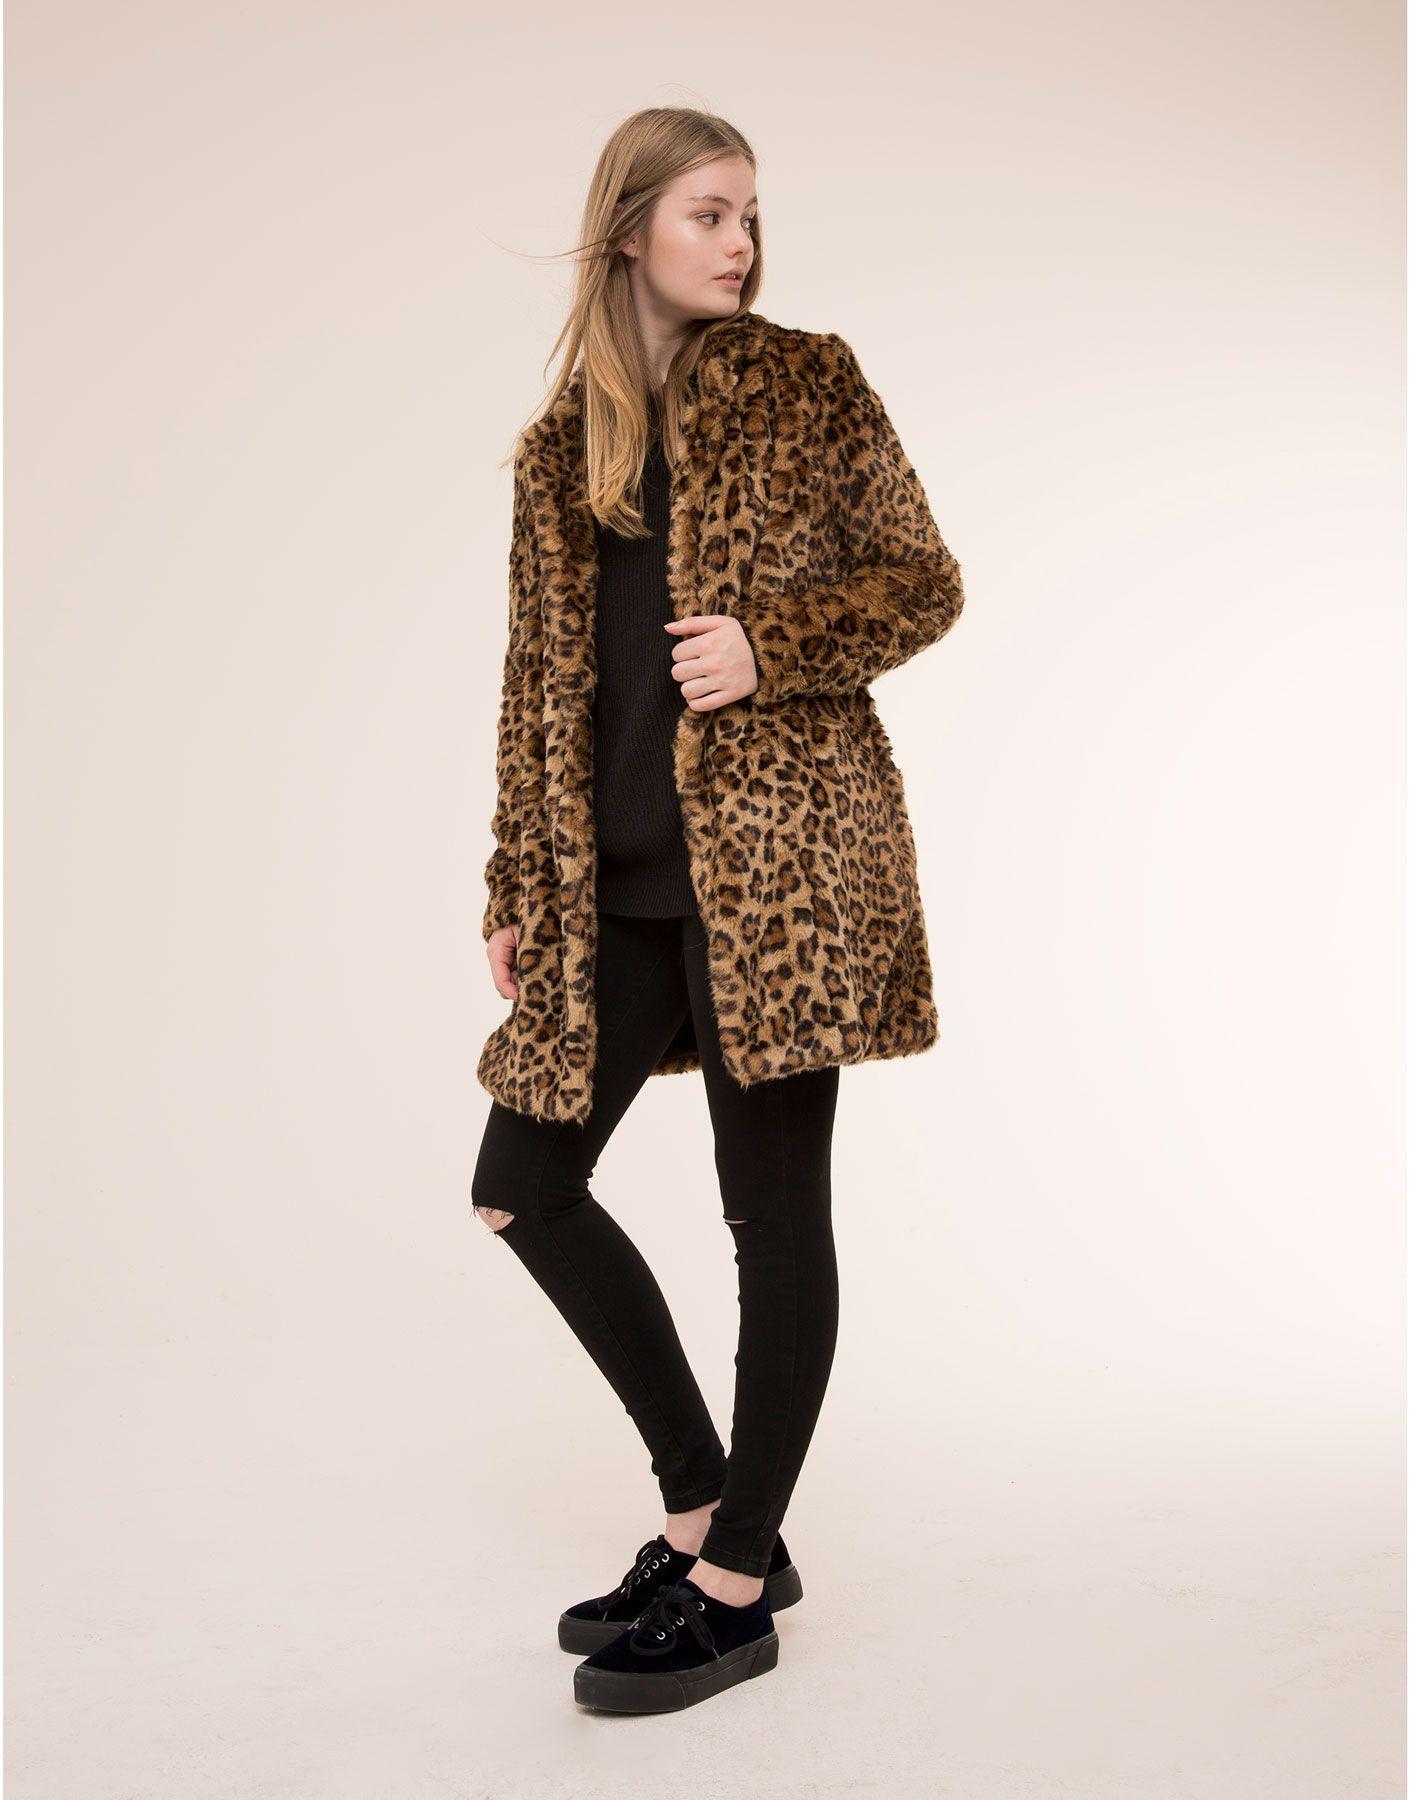 e806aa1dd4f1 :LEOPARD PRINT FAUX FUR COAT Manteau Leopard, Leopard Fur Coat, Pull & Bear